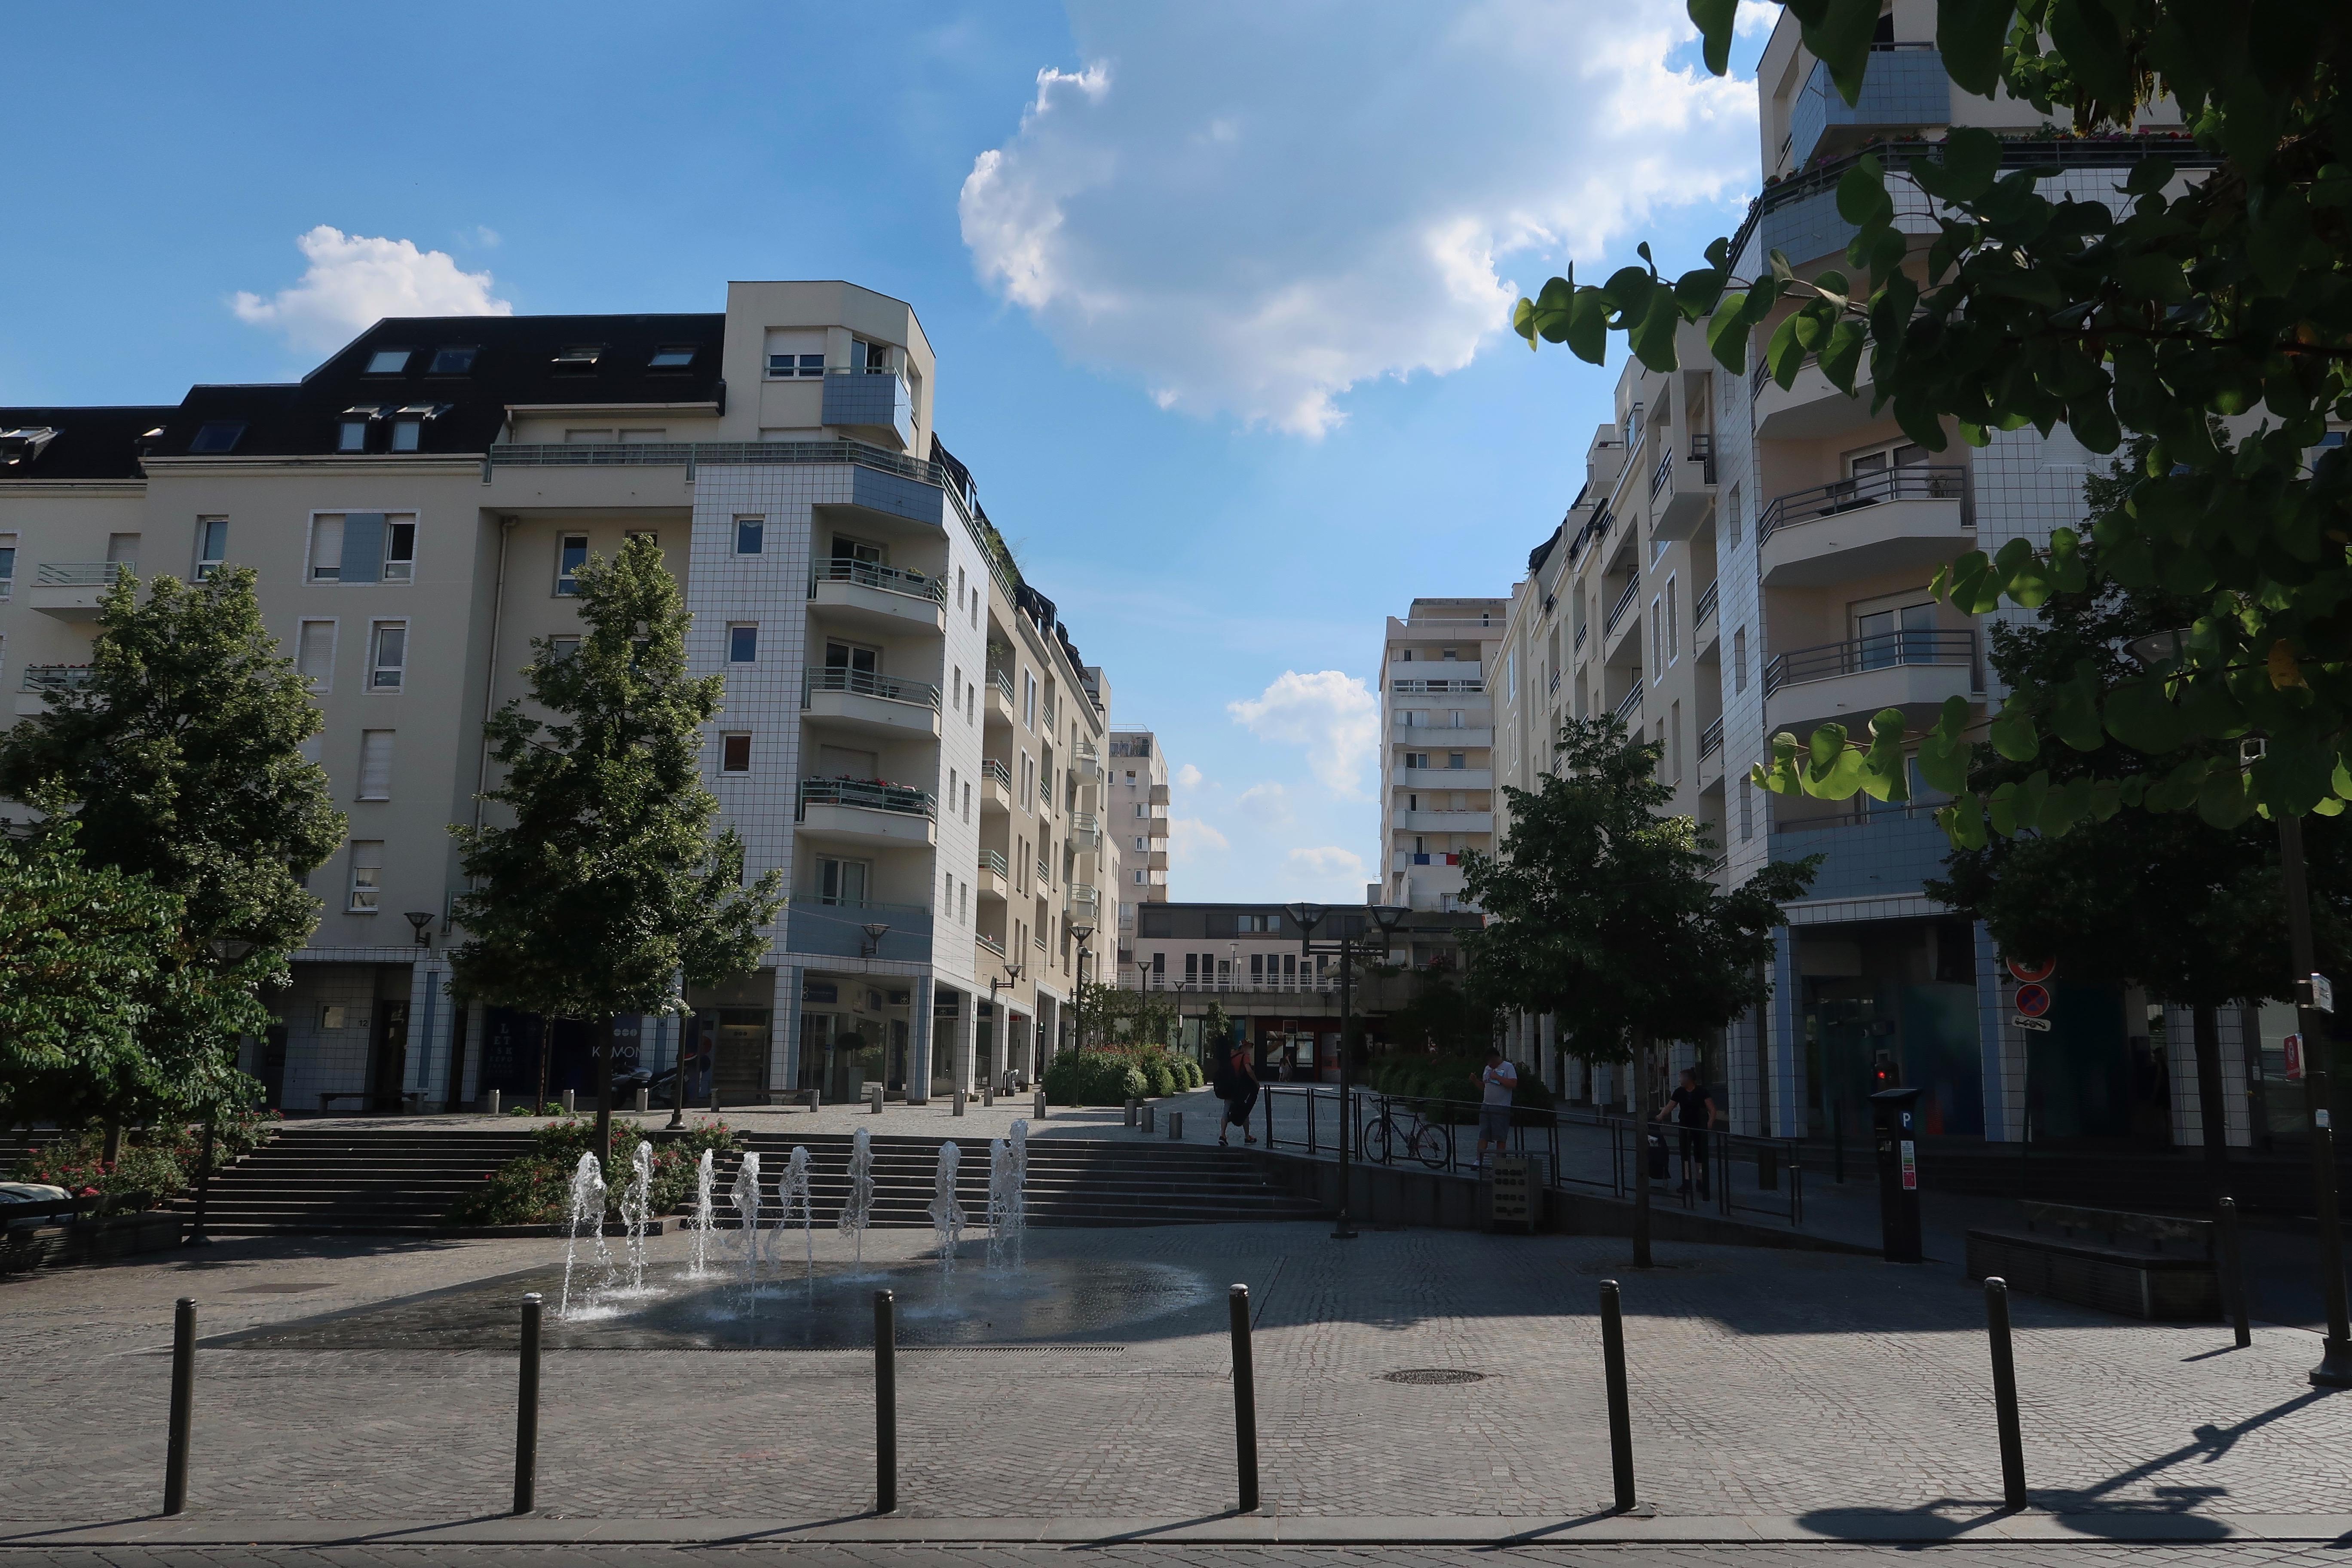 File Place du 8-Mai 1945 Suresnes 1.jpg - Wikimedia Commons 35a33951c0ea